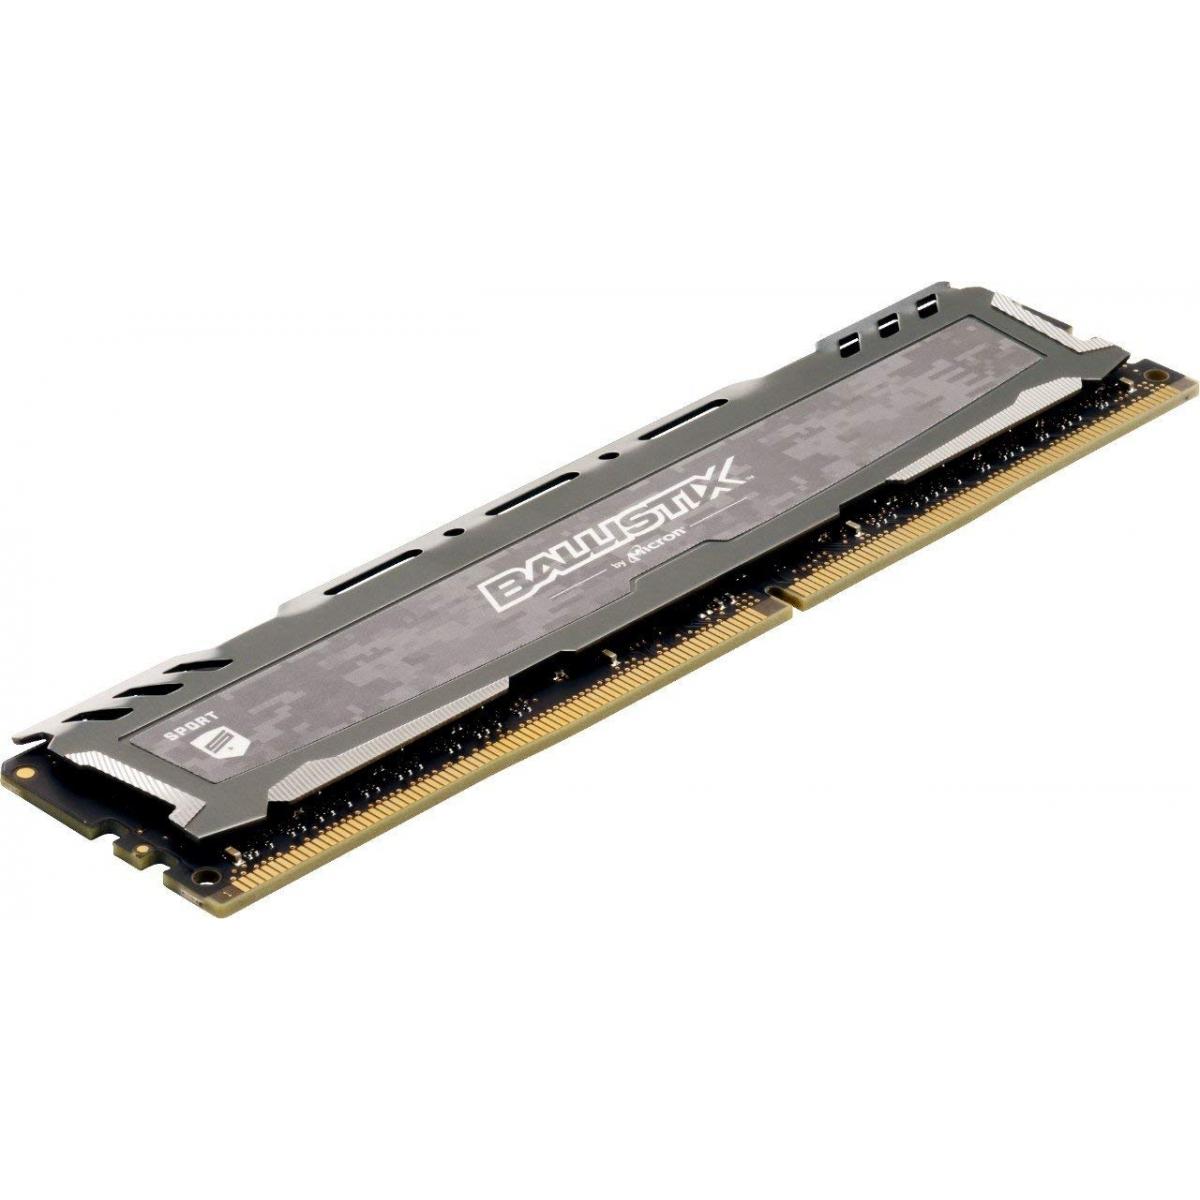 Memória DDR4 Crucial Ballistix Sport Lt, 16GB (2x8GB) 3200MHz, Grey, BLS2K8G4D32AESBK